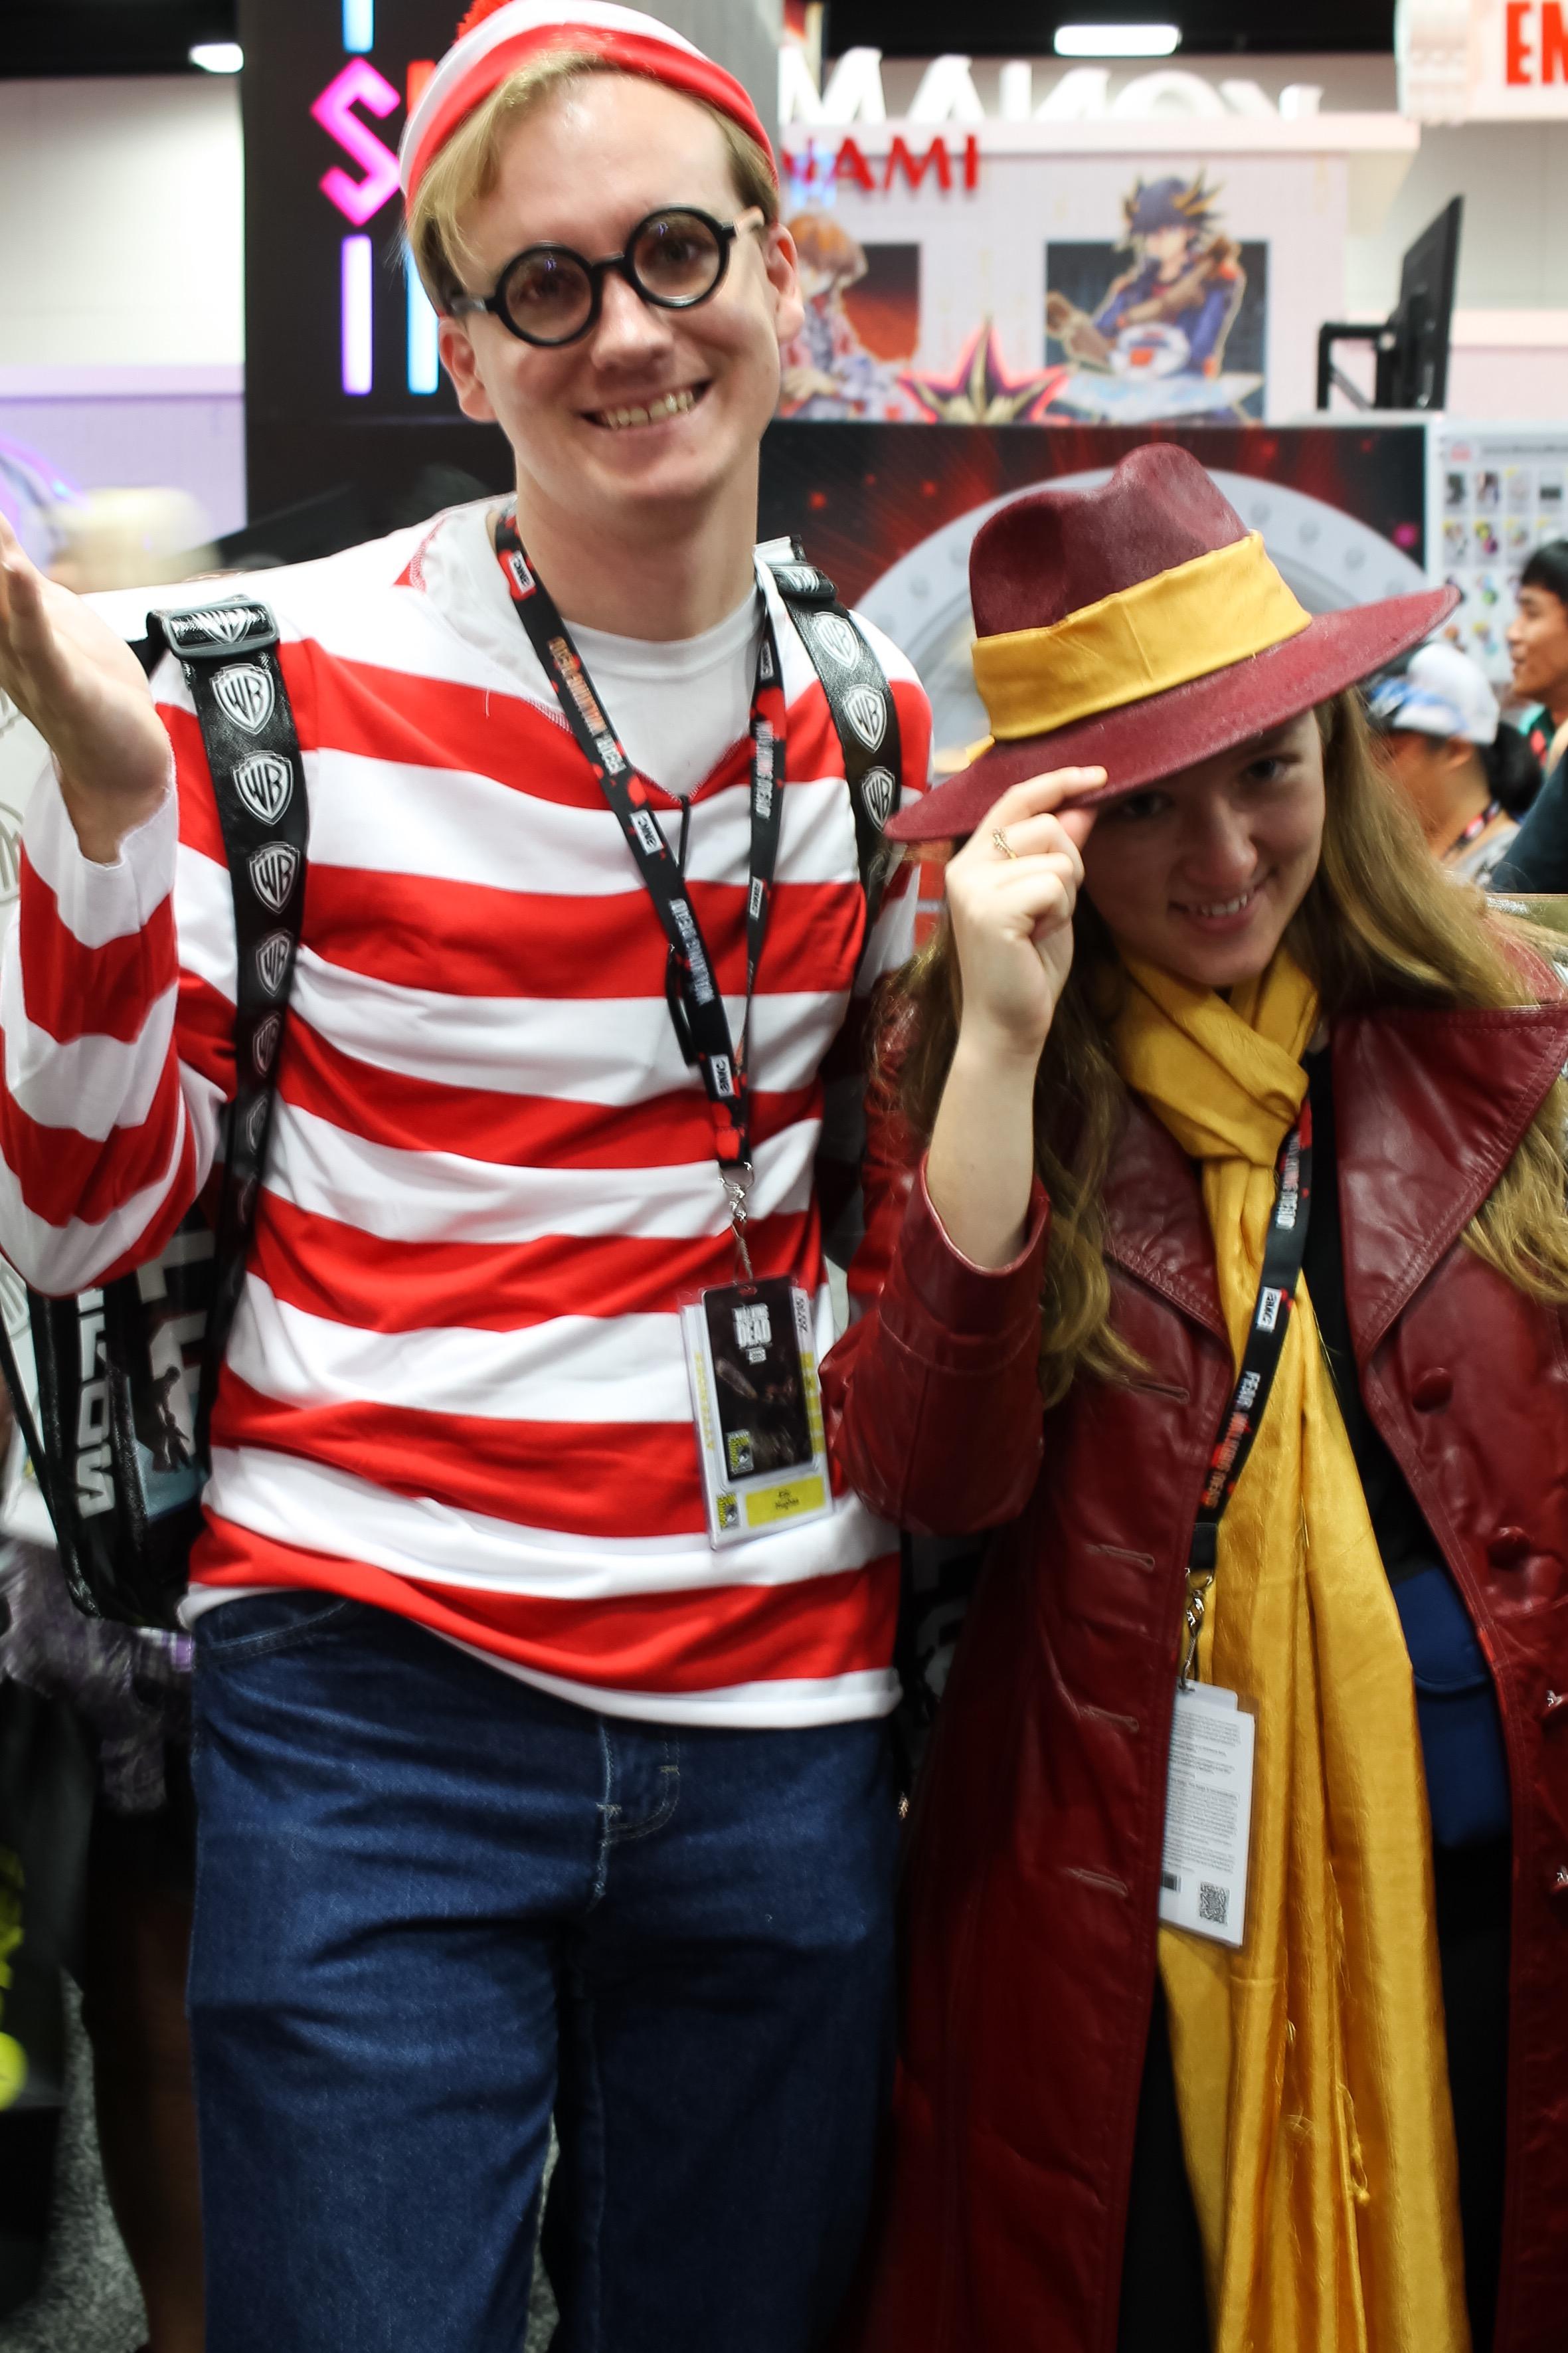 Where's Waldo and CarmenSandiego